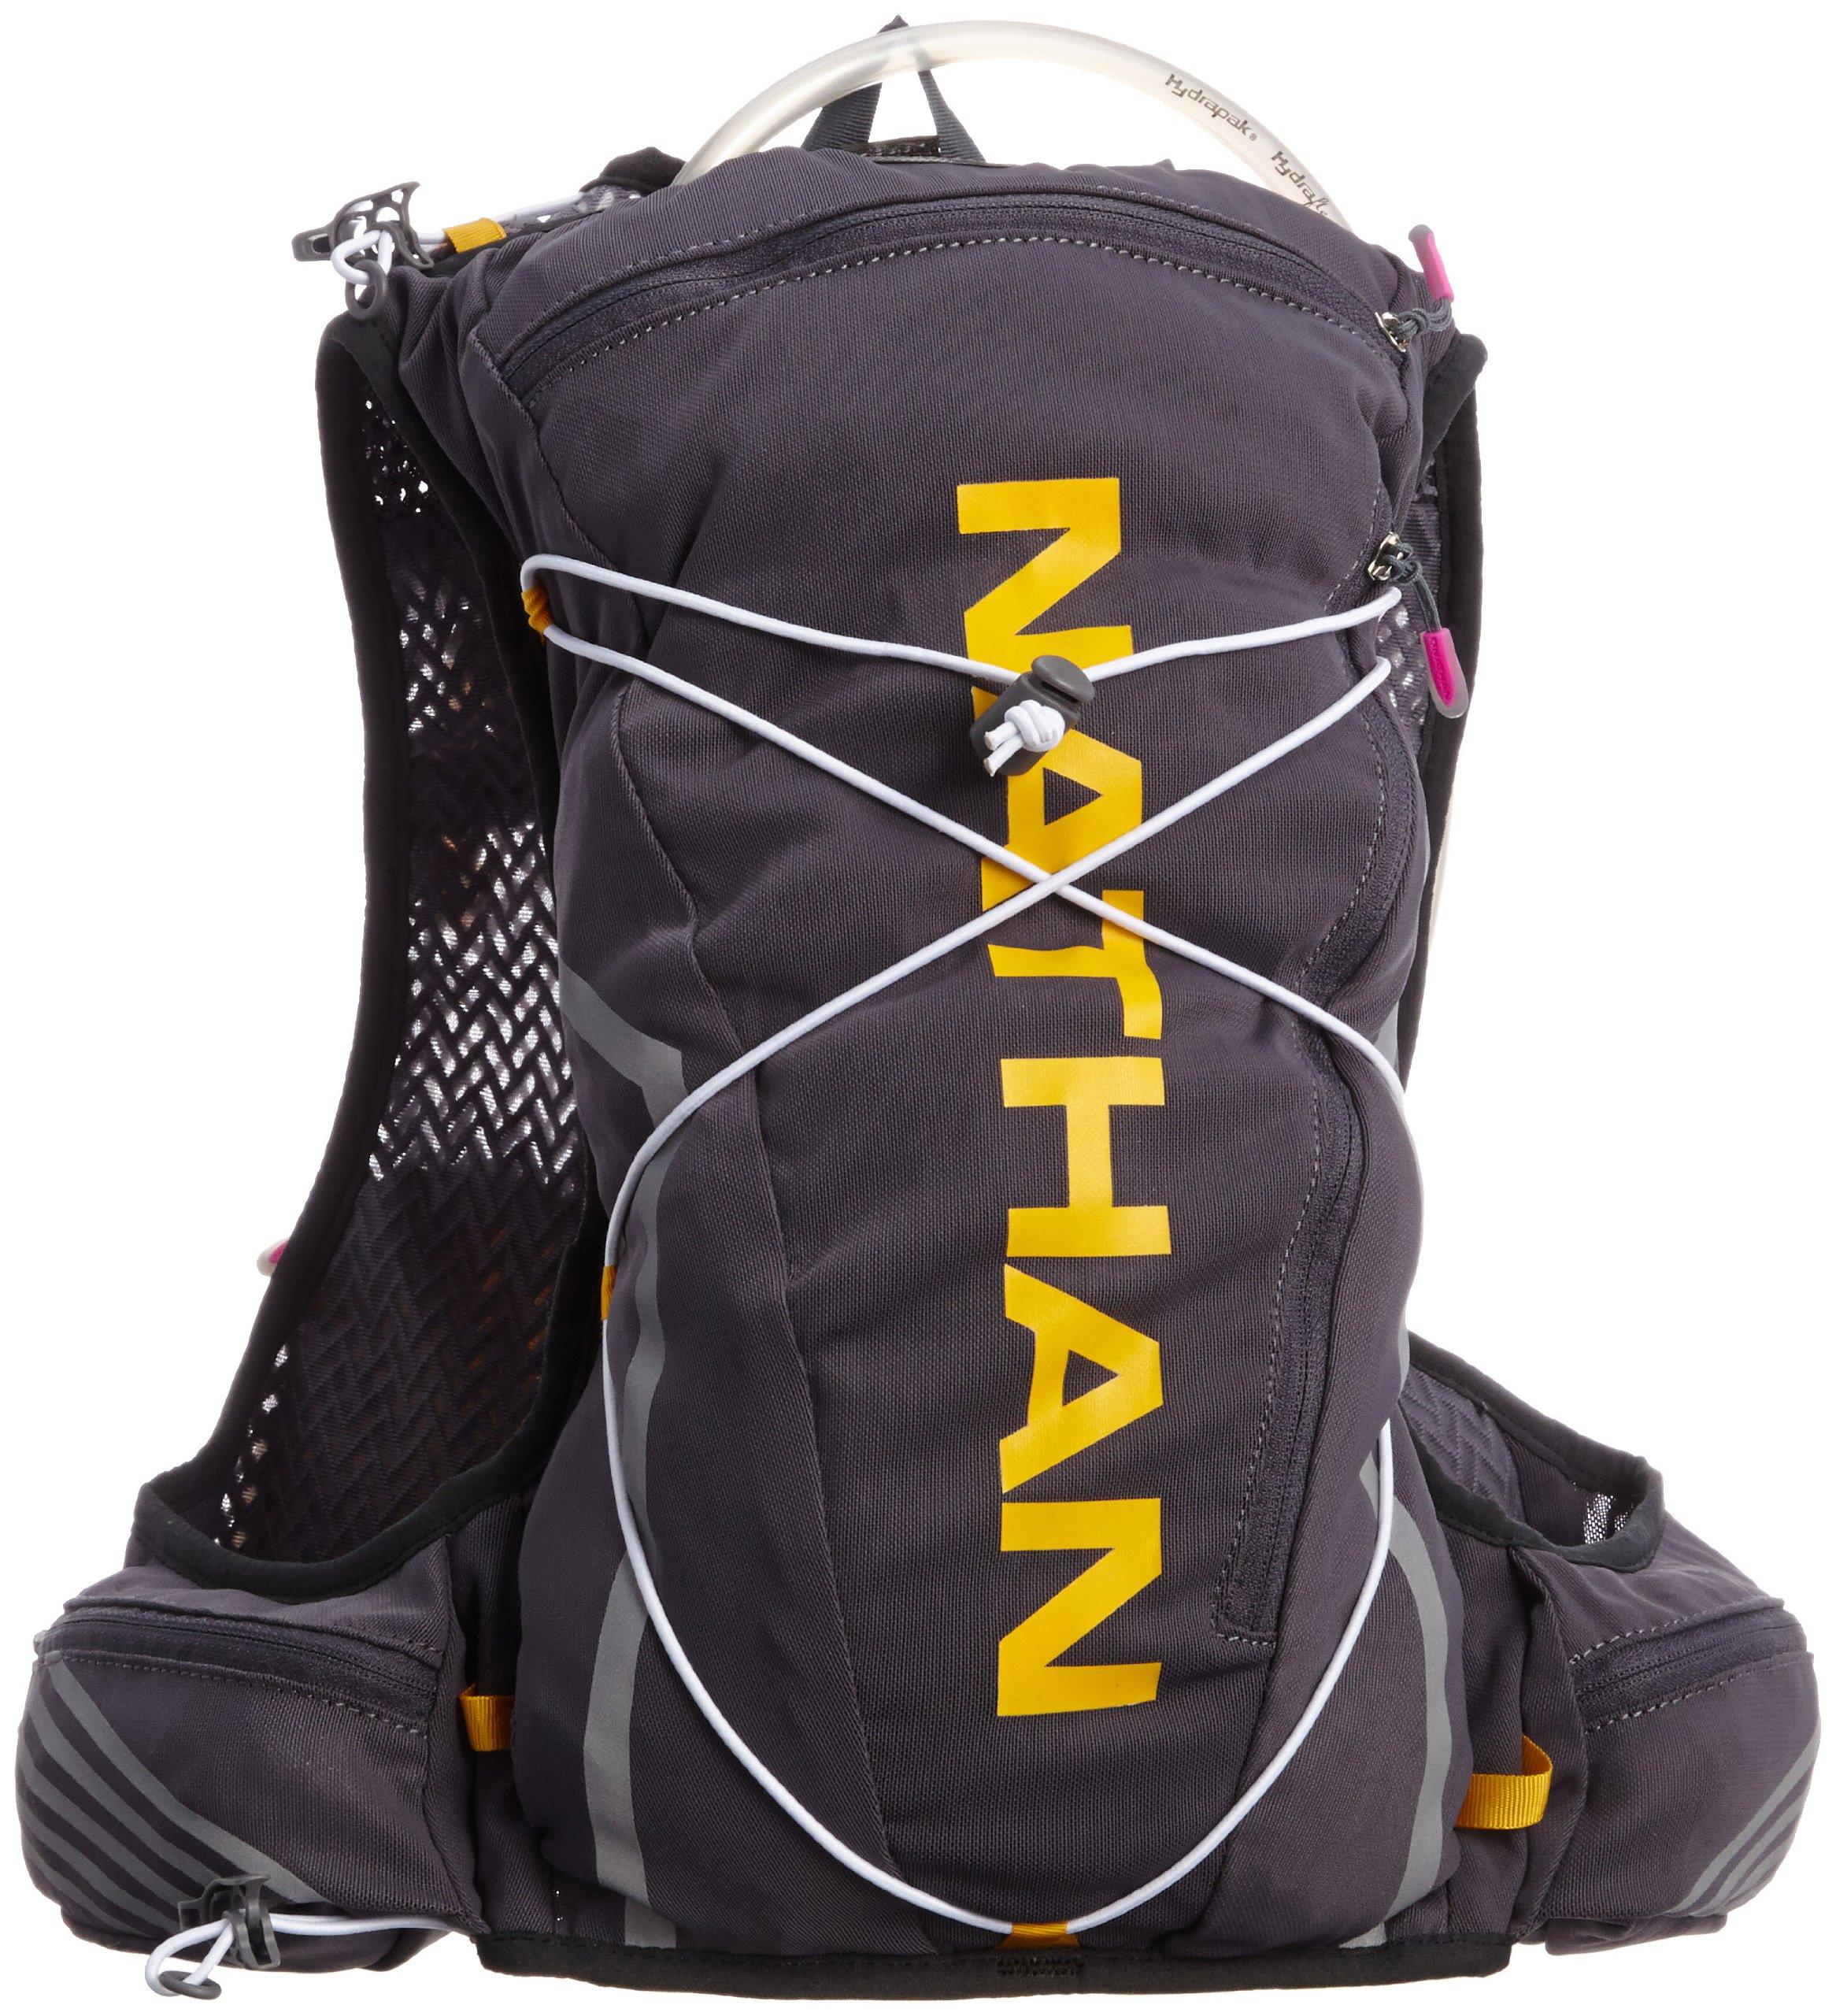 Nathan VaporShadow 2-Liter Hydration Vest, Nathan Grey, Large/X-Large